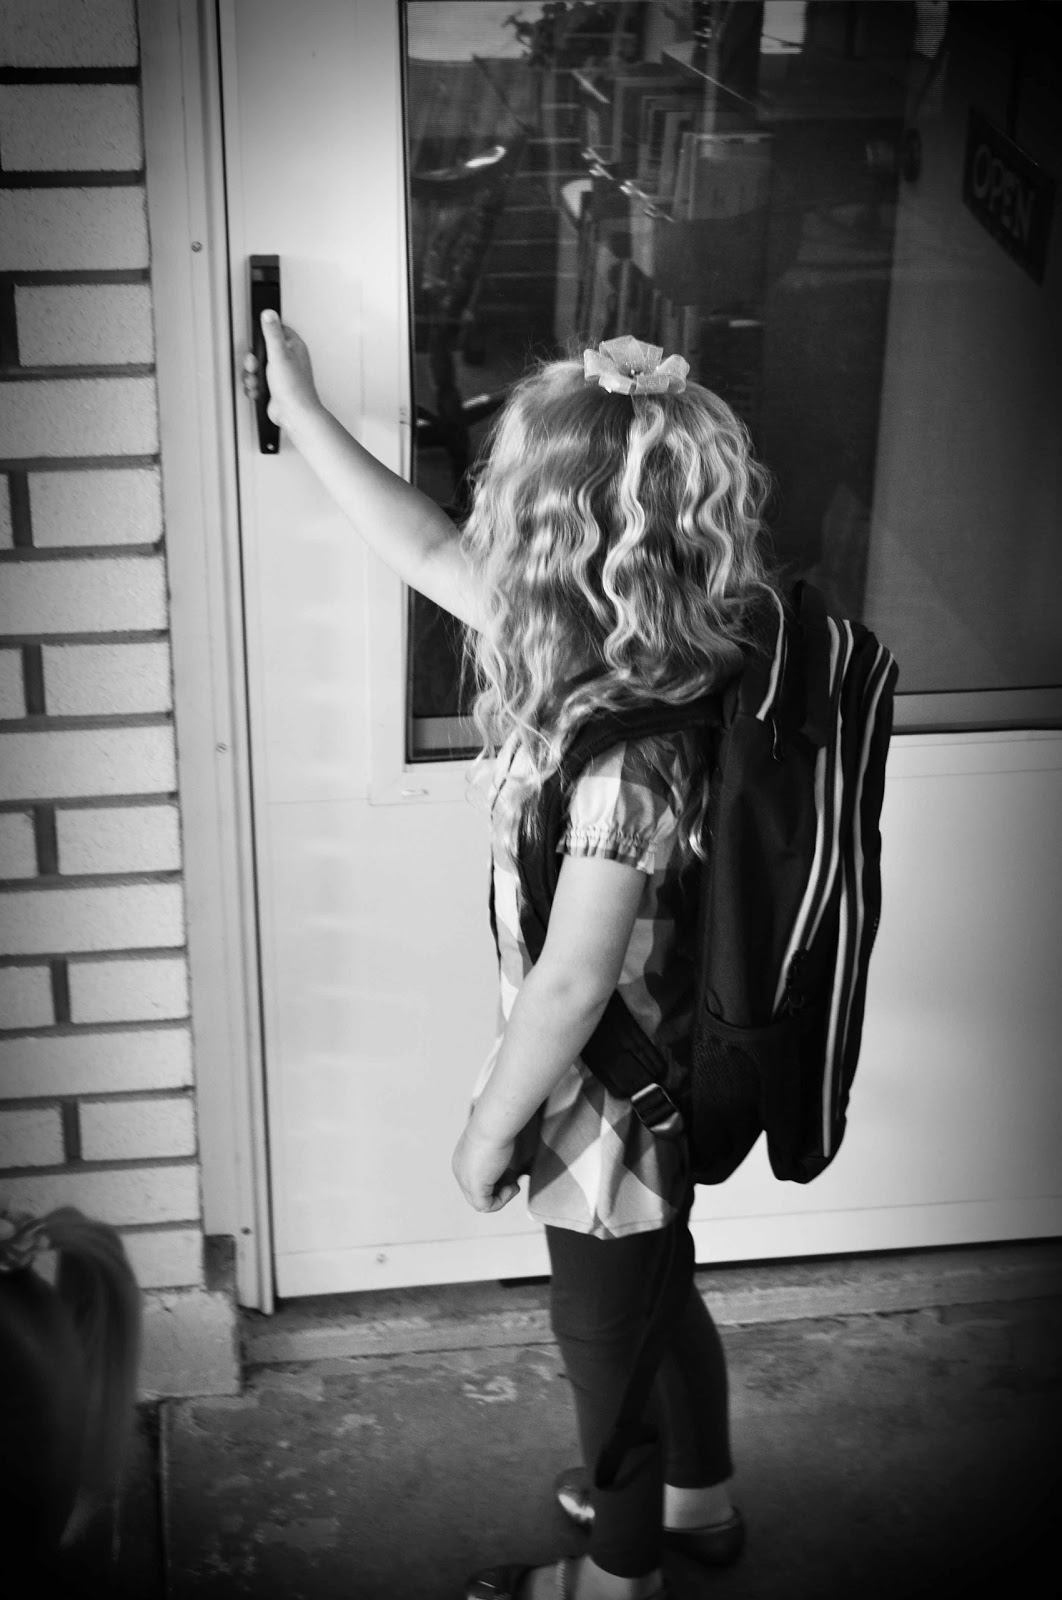 Kaitlyn walking into preschool